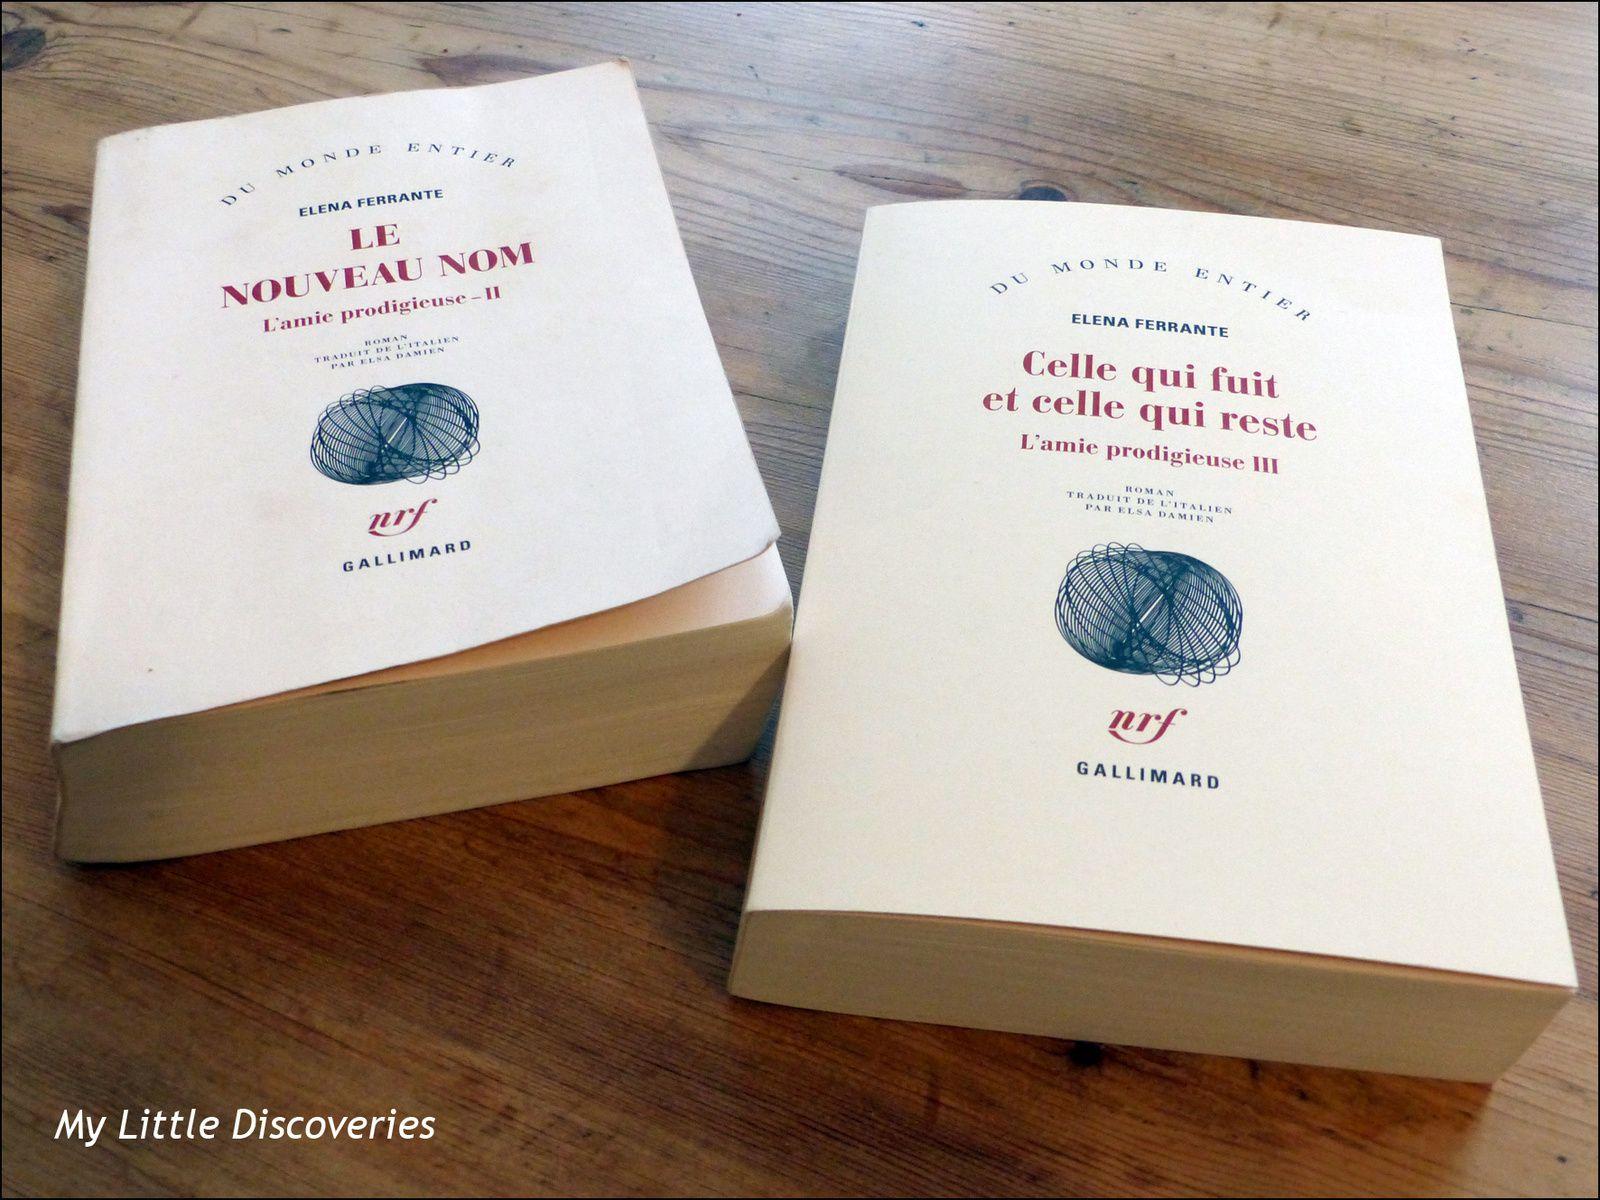 Mes lectures de printemps : d'Elena Ferrante à Emmanuel Macron